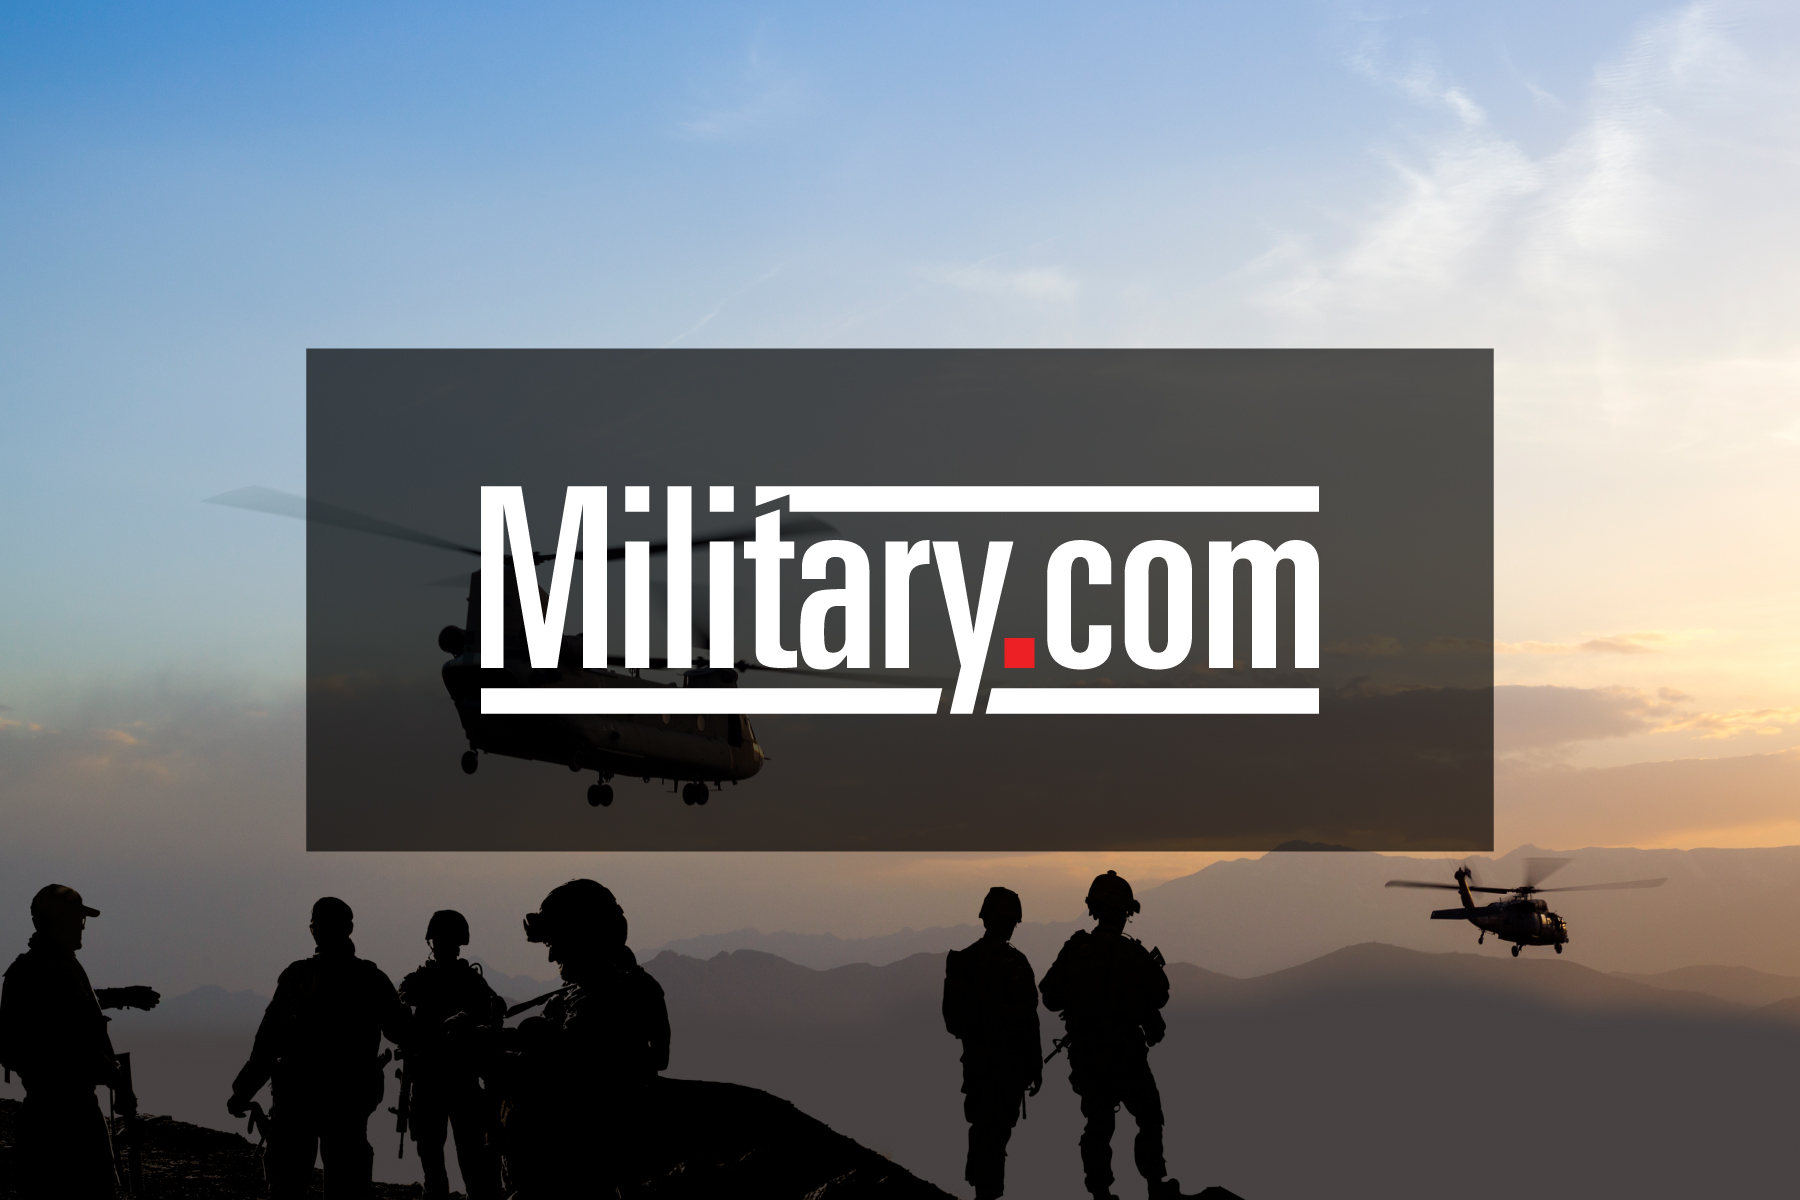 CentCom Chief Warns of Syrian Bioweapons, Iran